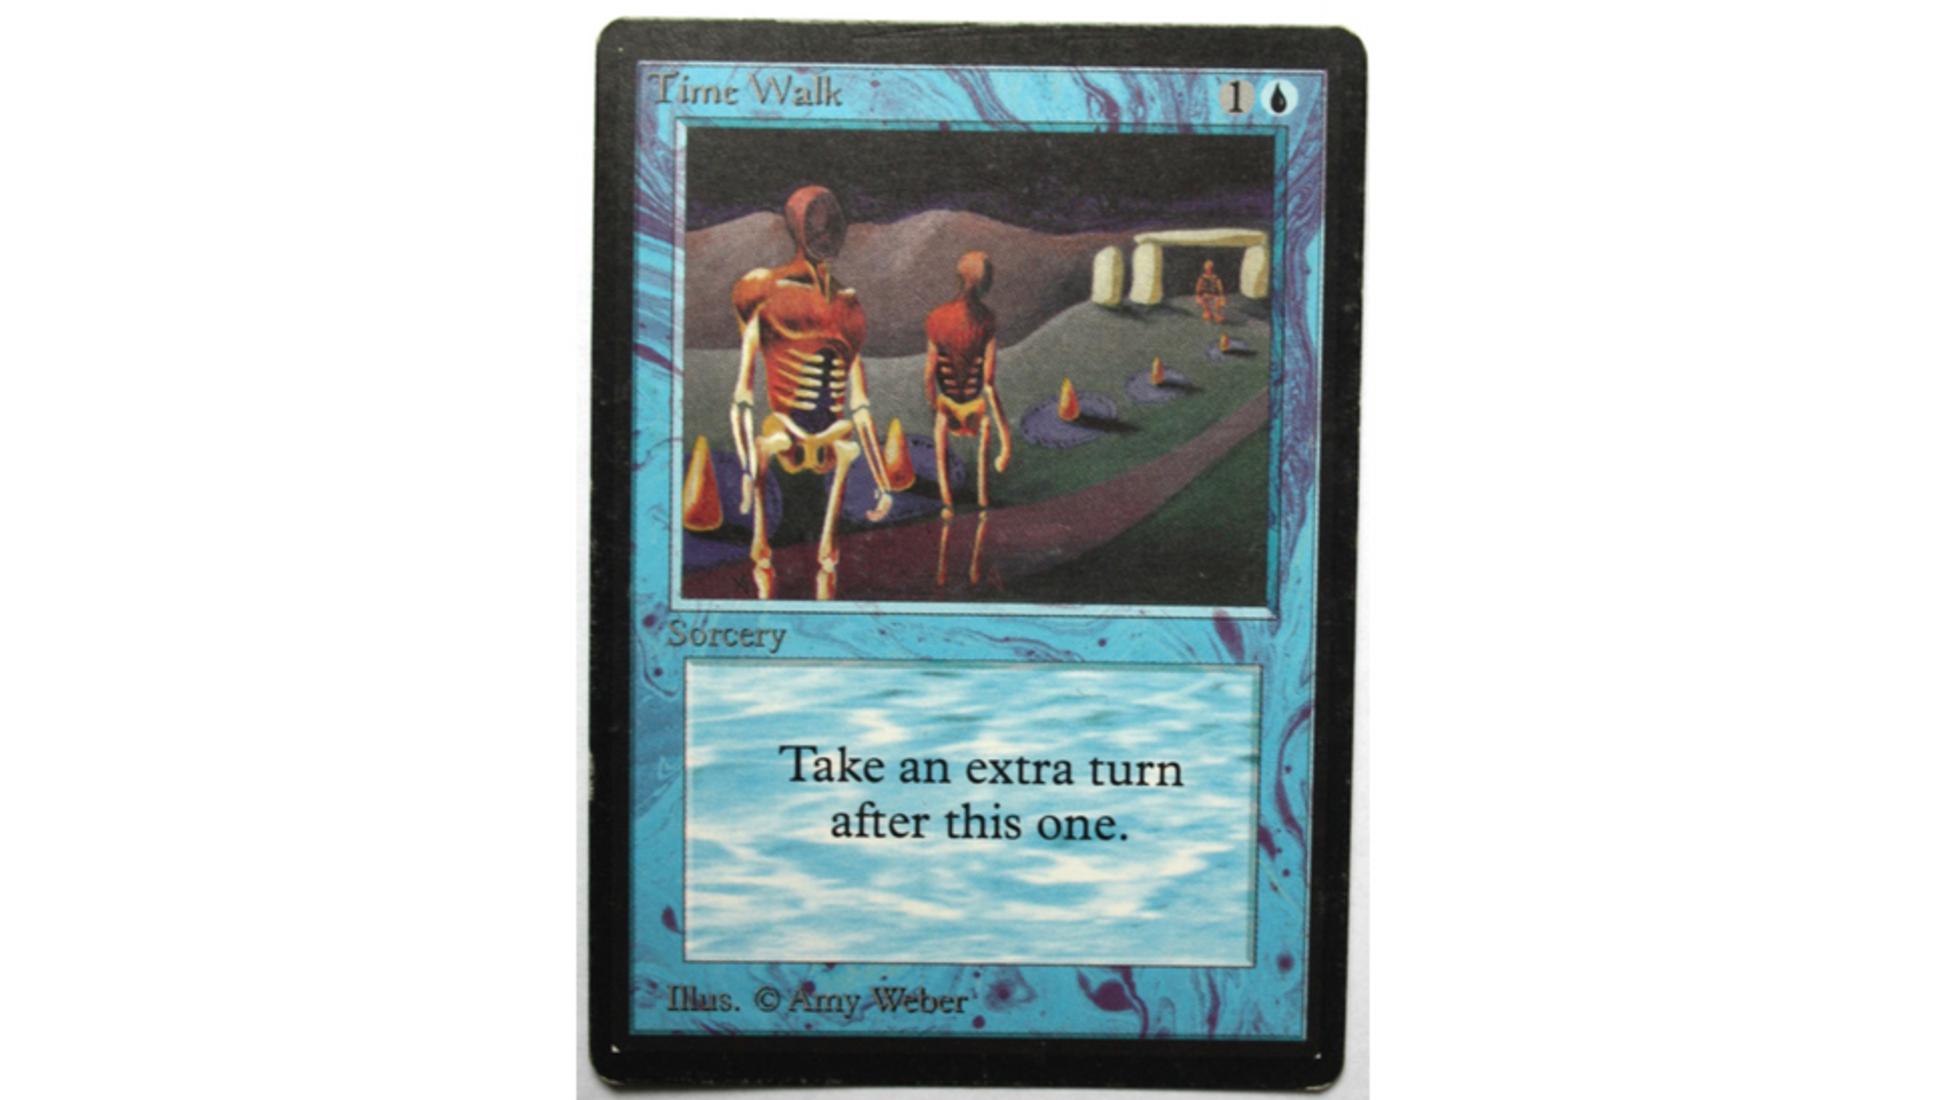 Le 5 carte più costose di Magic  l Adunanza - Catawiki 75746aeff5a5